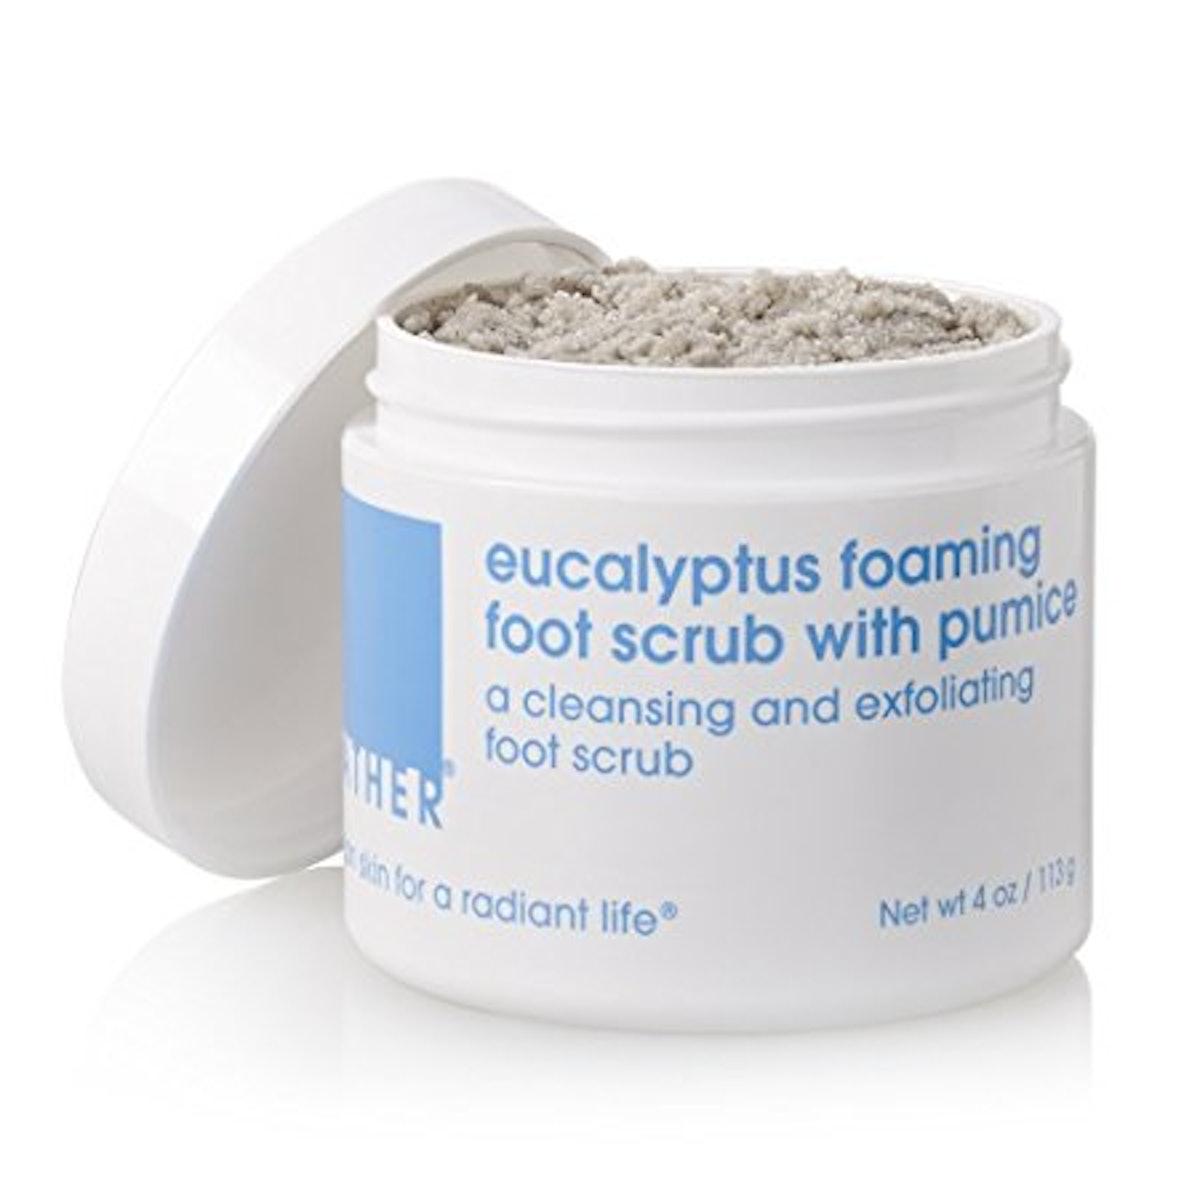 LATHER Eucalyptus Foaming Foot Scrub with Pumice